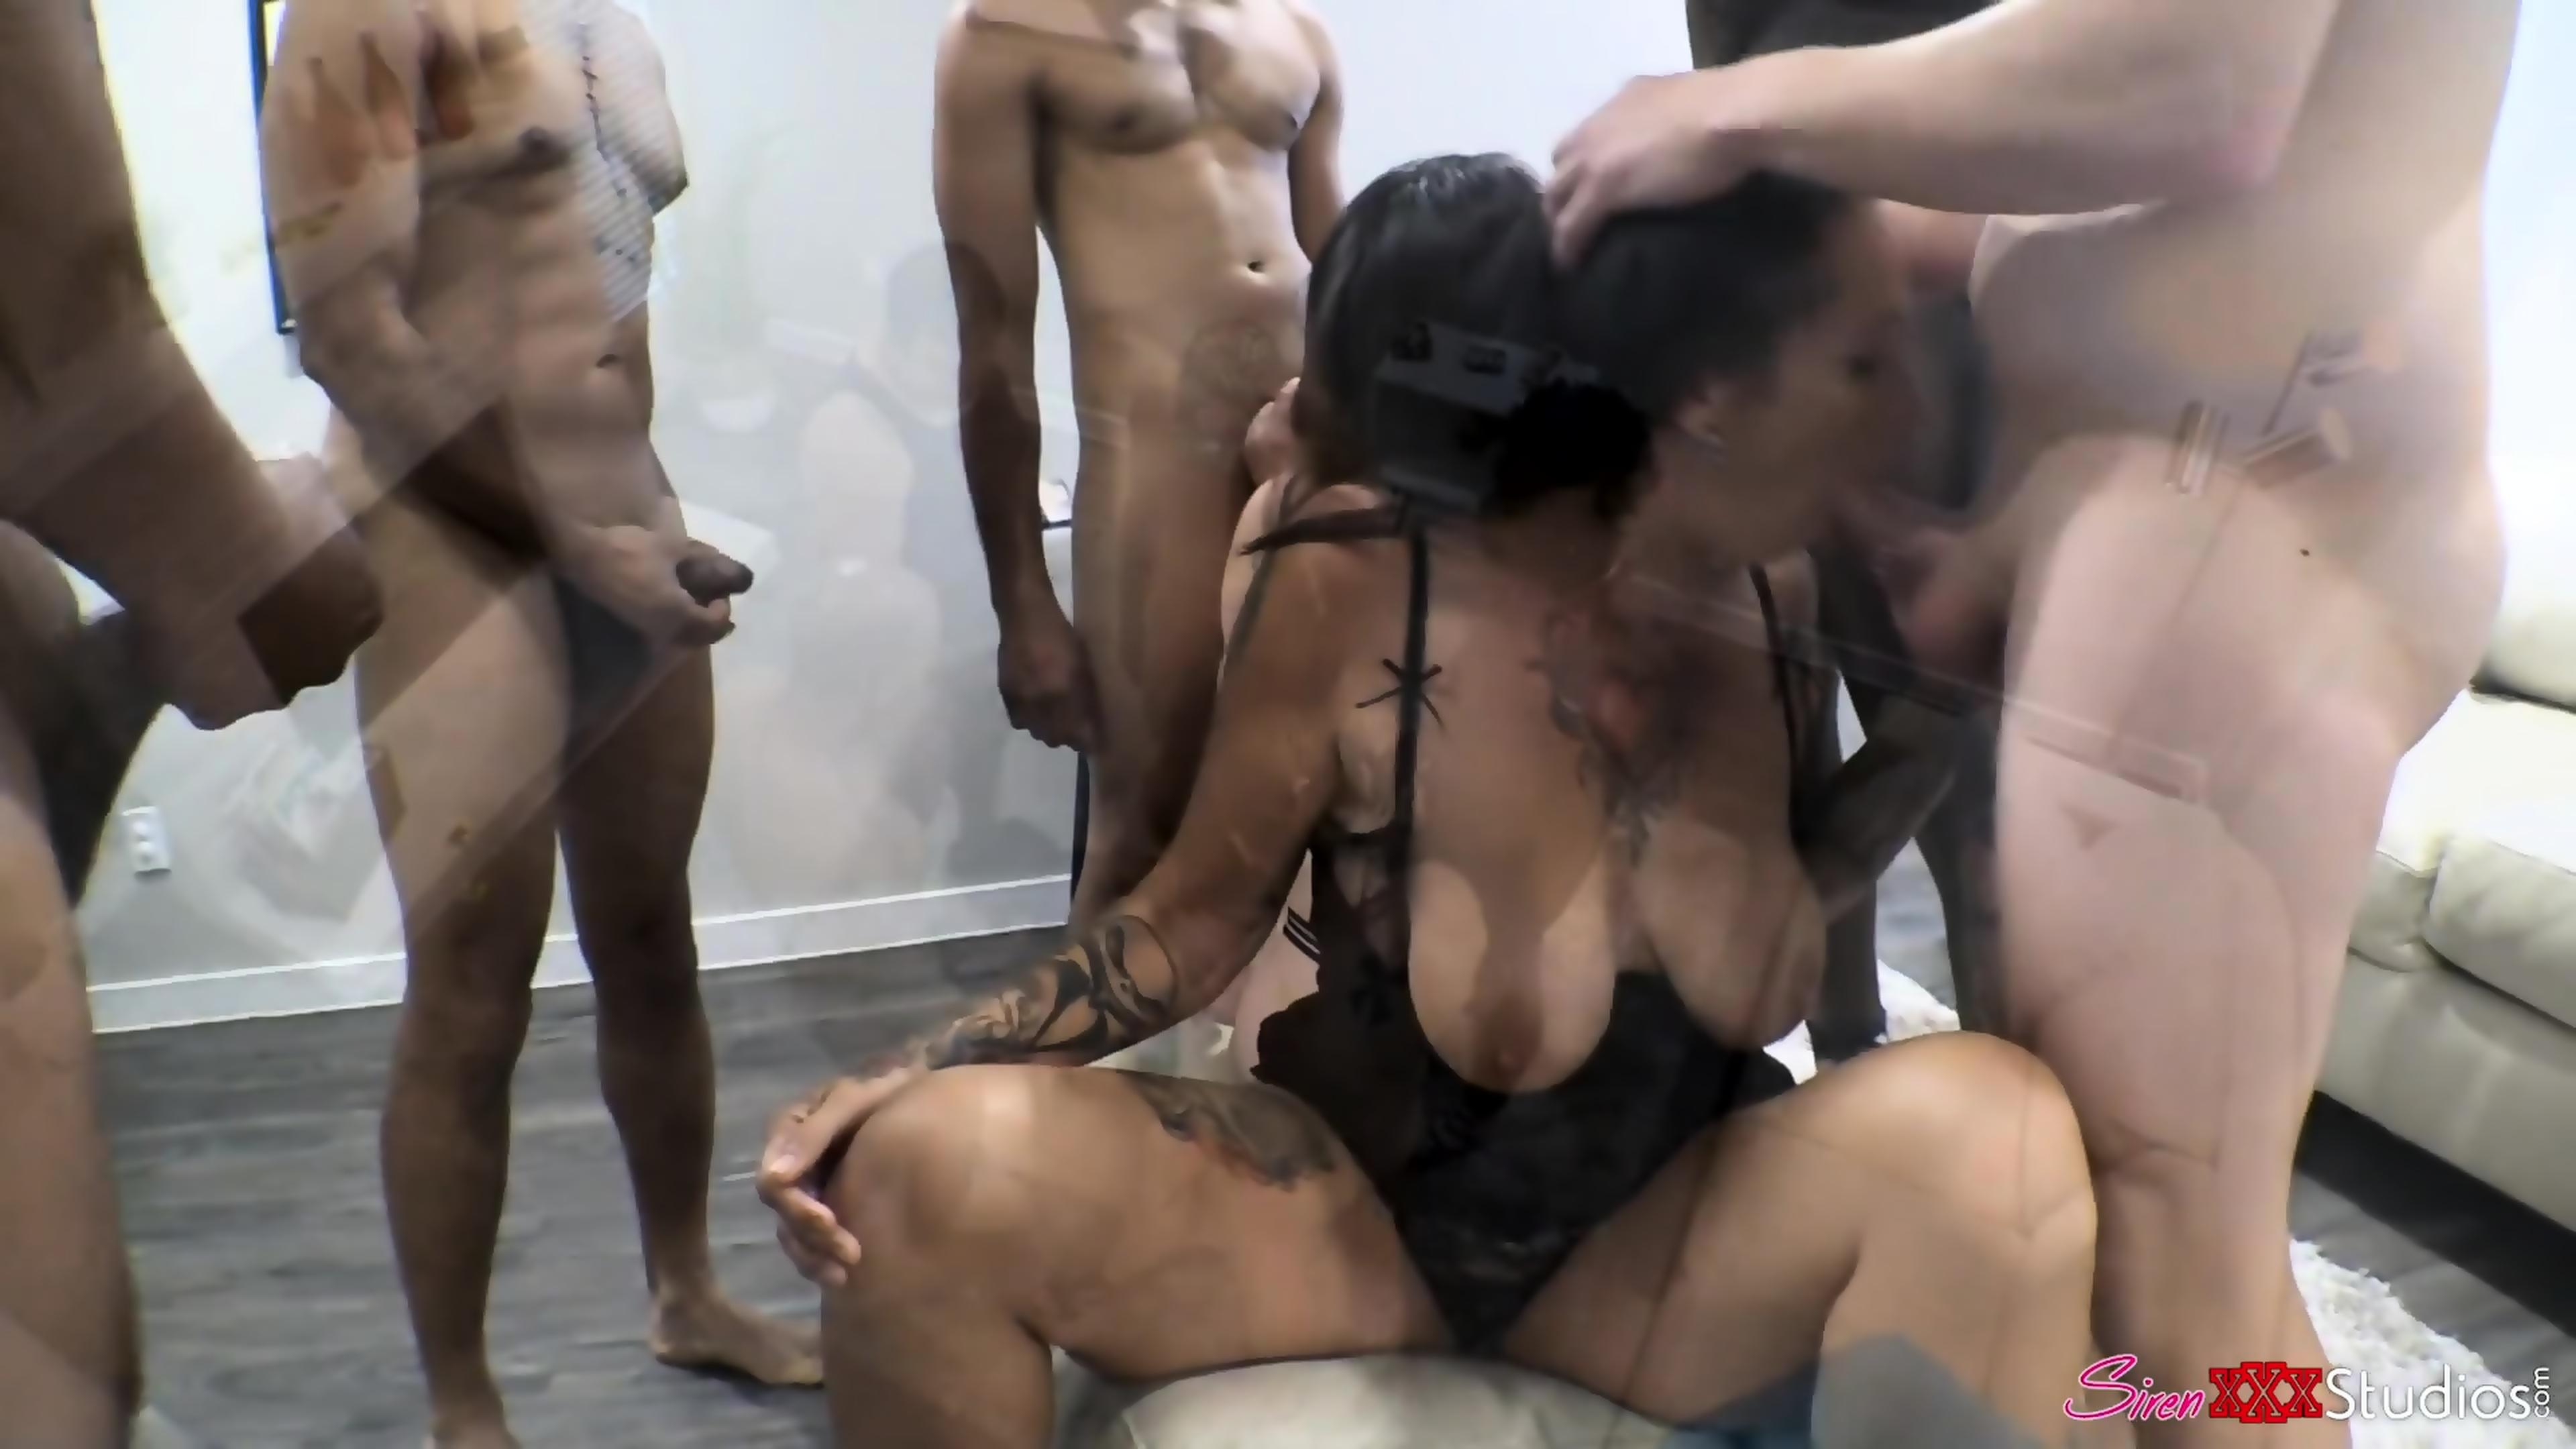 Porn movie Free twink series pics